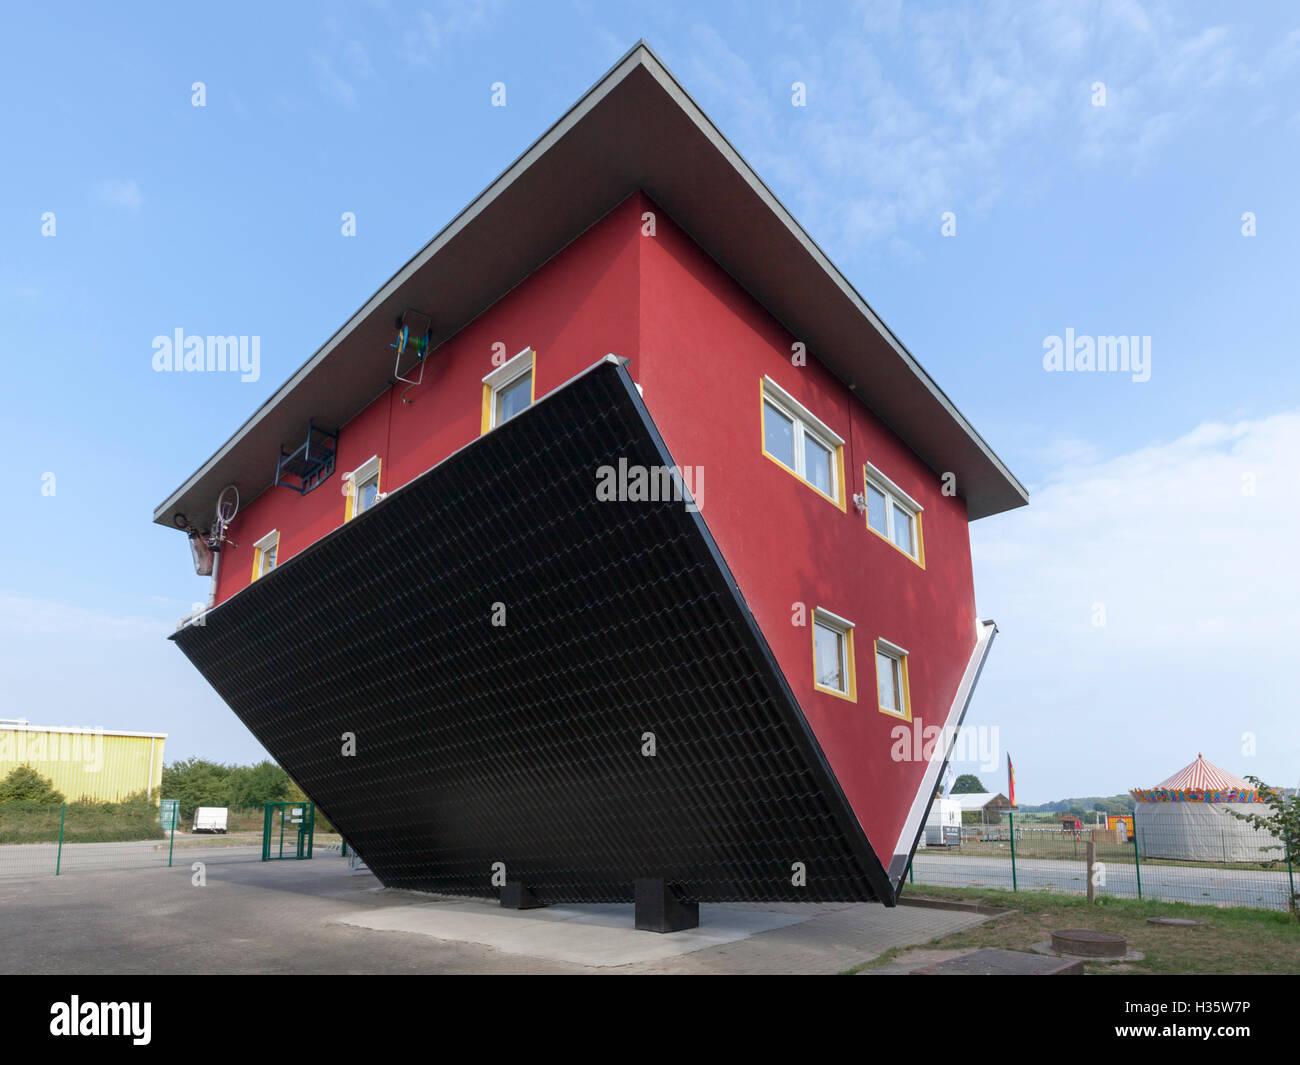 Upside down house at Putbus, Ruegen - Stock Image